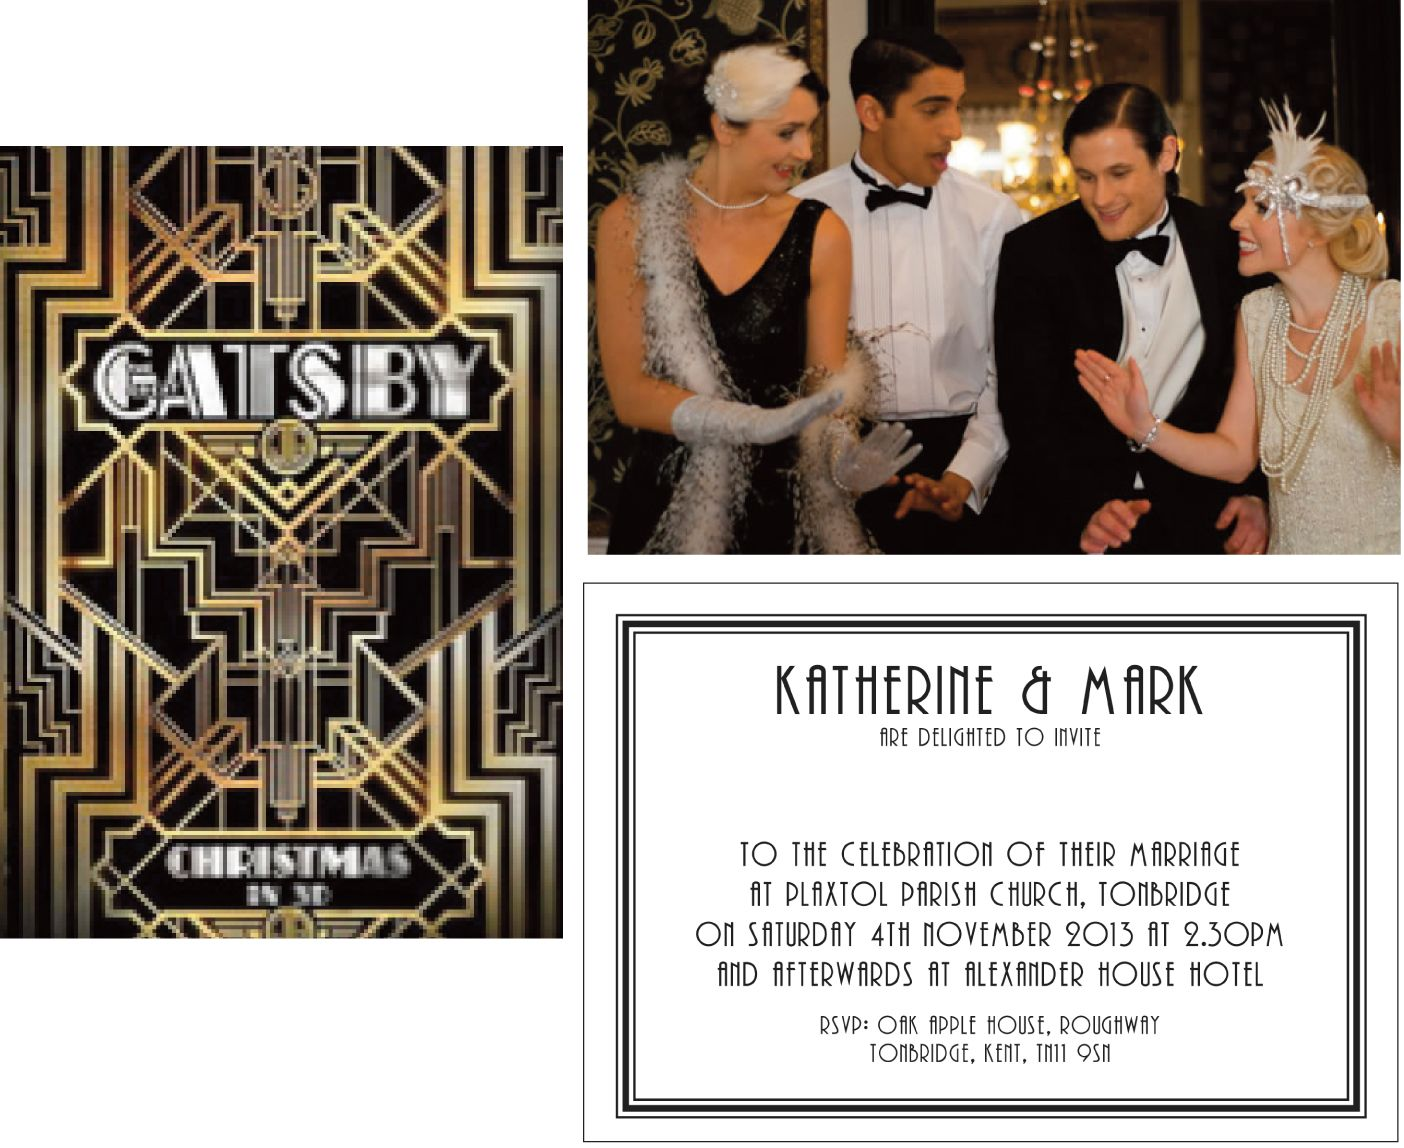 Wedding Invitation Wording: Gatsby Wedding Invitation Templates ...